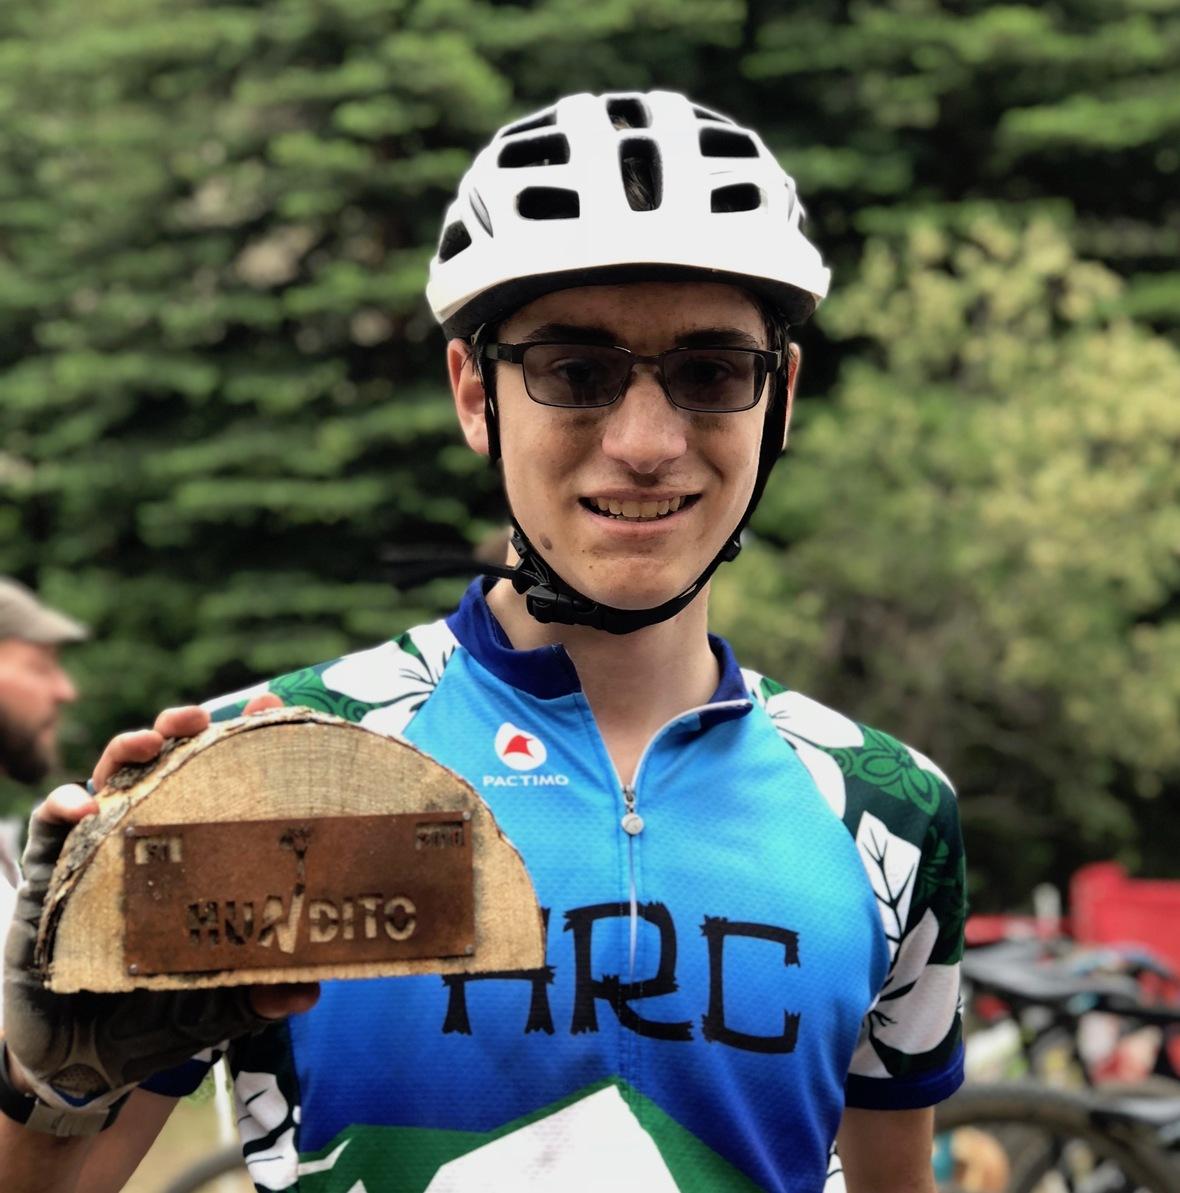 Bailey Hundo HRC Rider